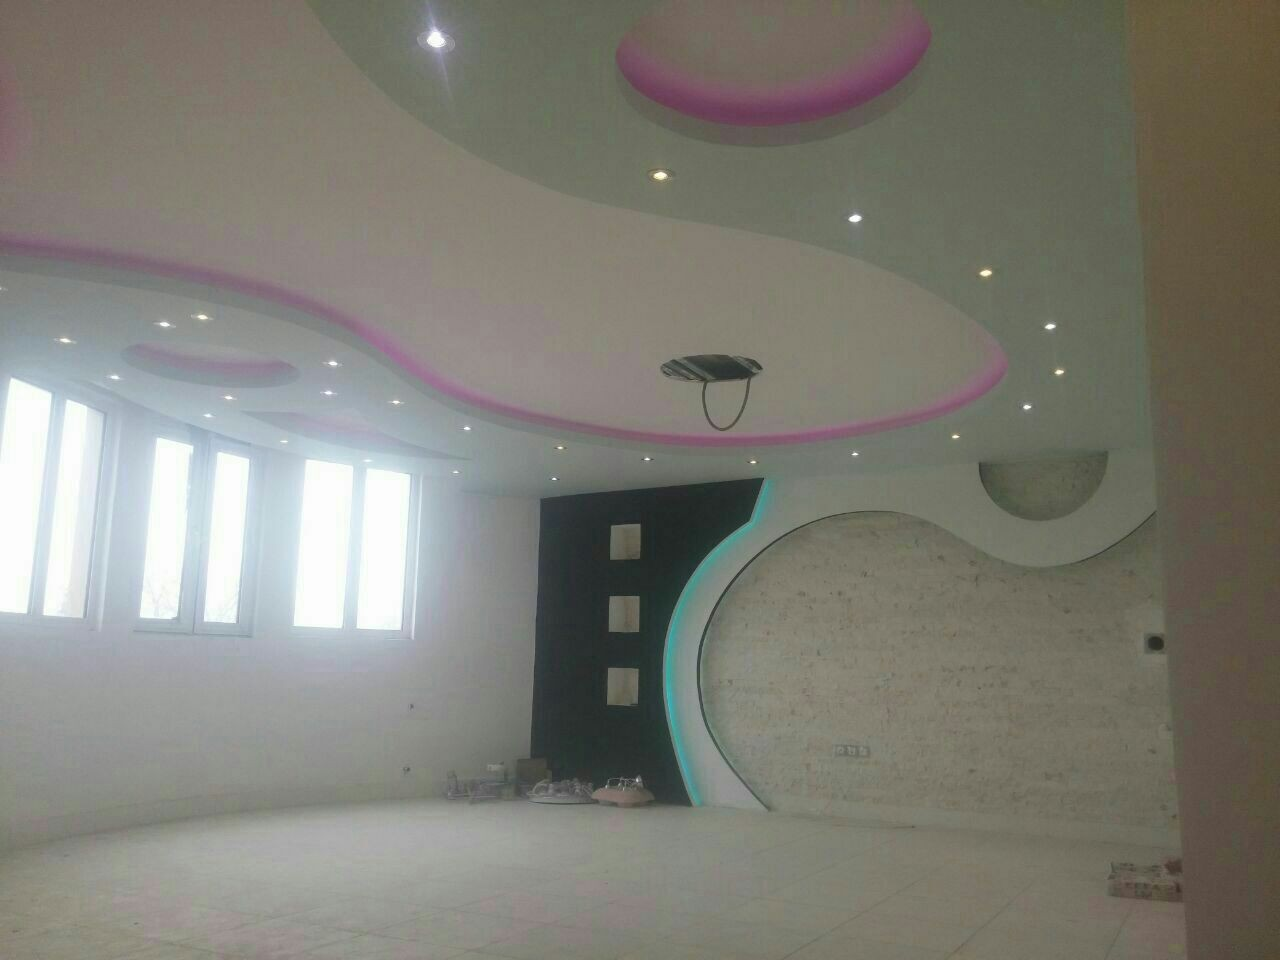 http://asreesfahan.com/AdvertisementSites/1395/08/07/main/tmp_21901-IMG_20161028_190454576980692.jpg